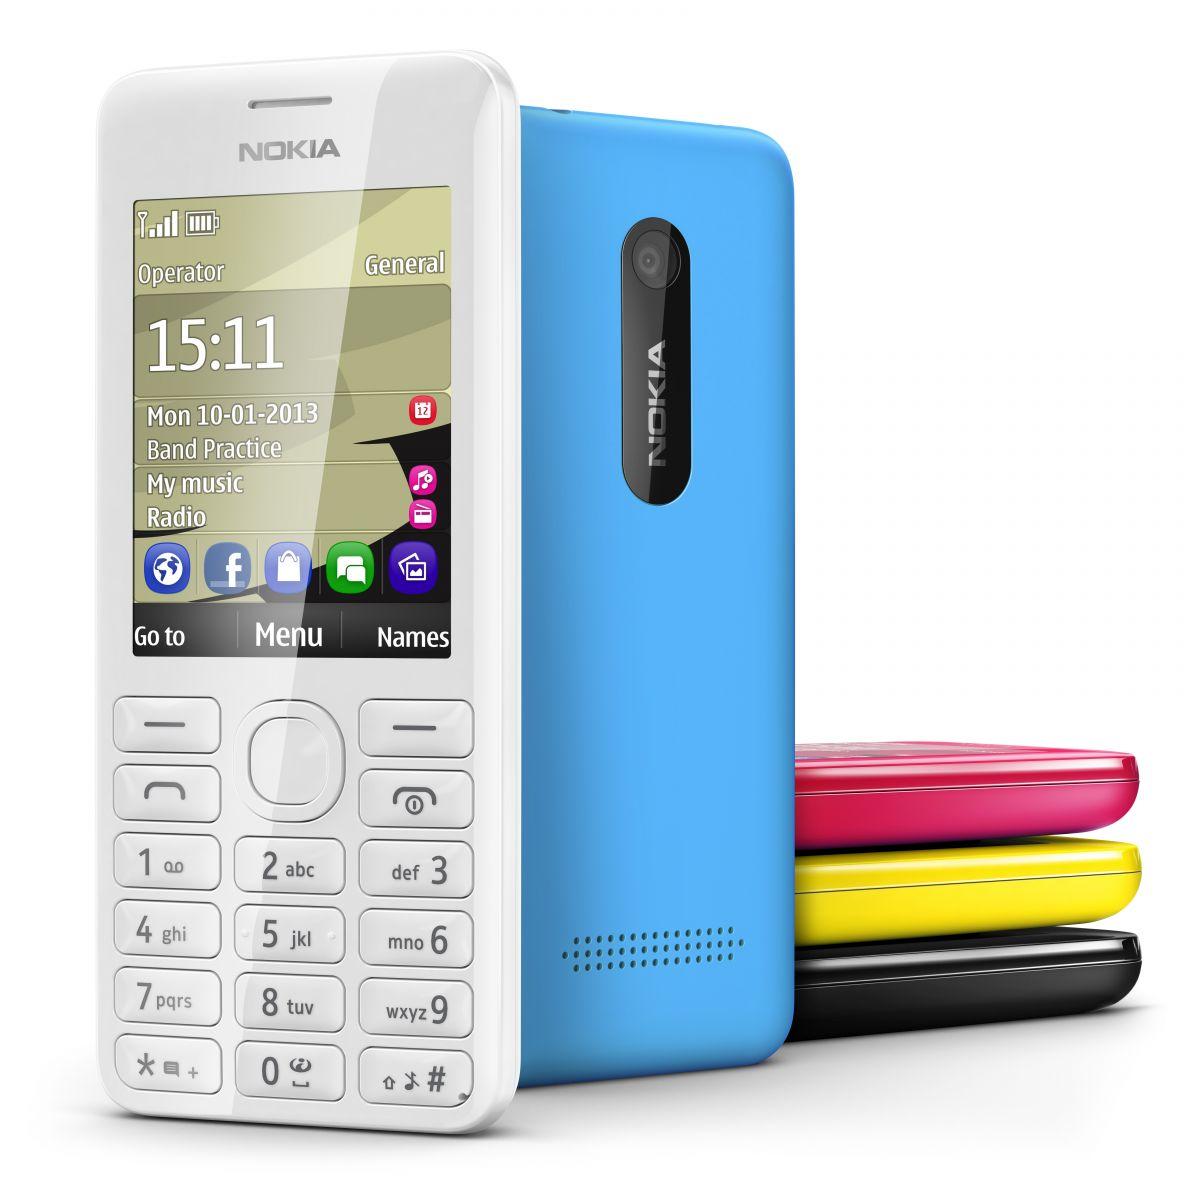 Память SIM полна» на Nokia - kolyaseg - LiveJournal